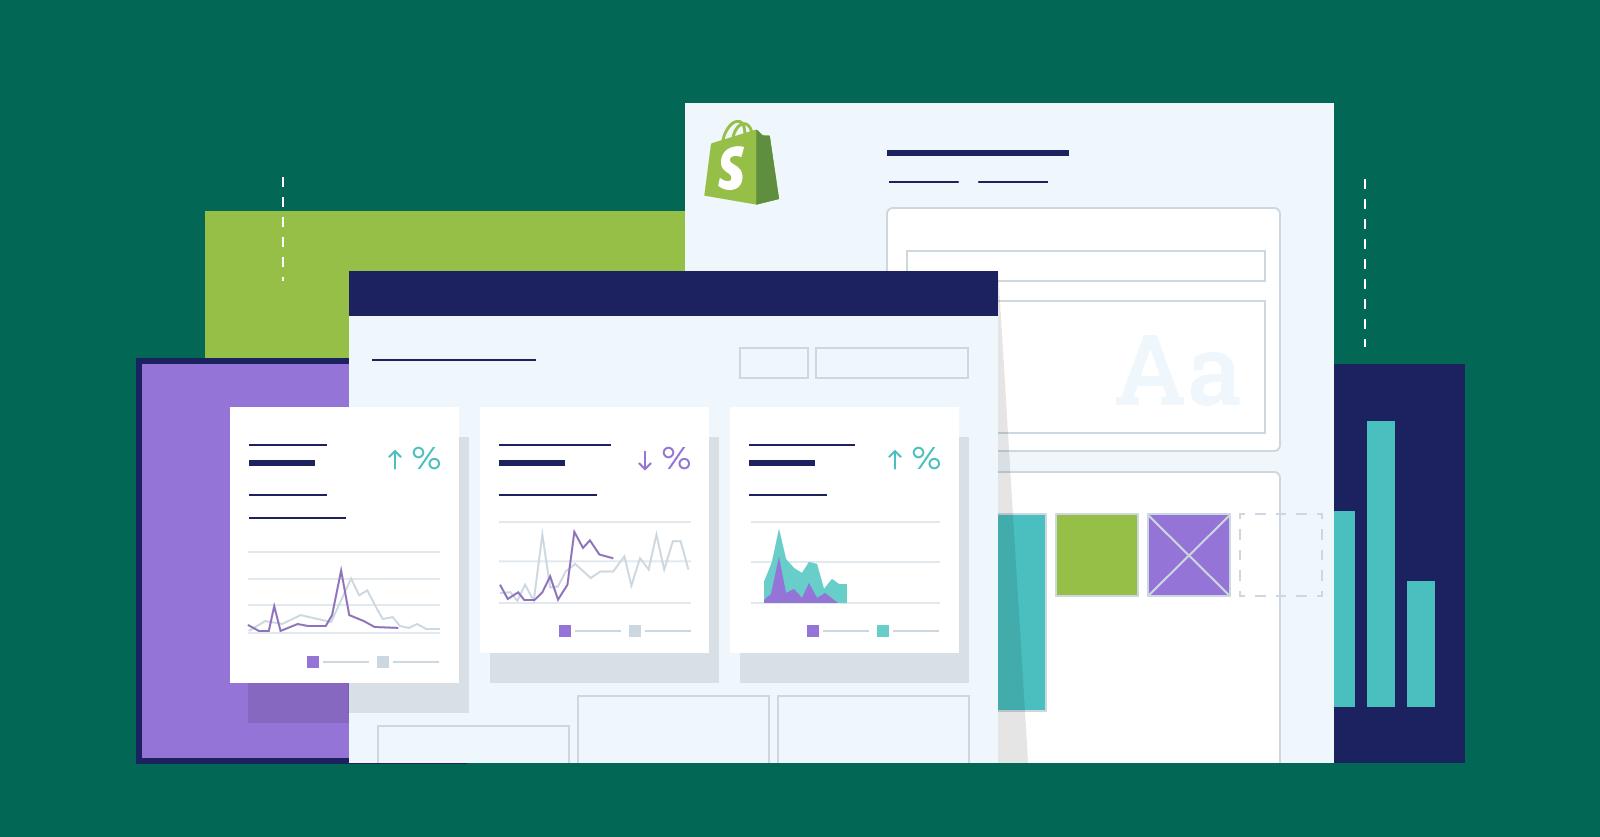 Shopify Revenue and Merchant Statistics